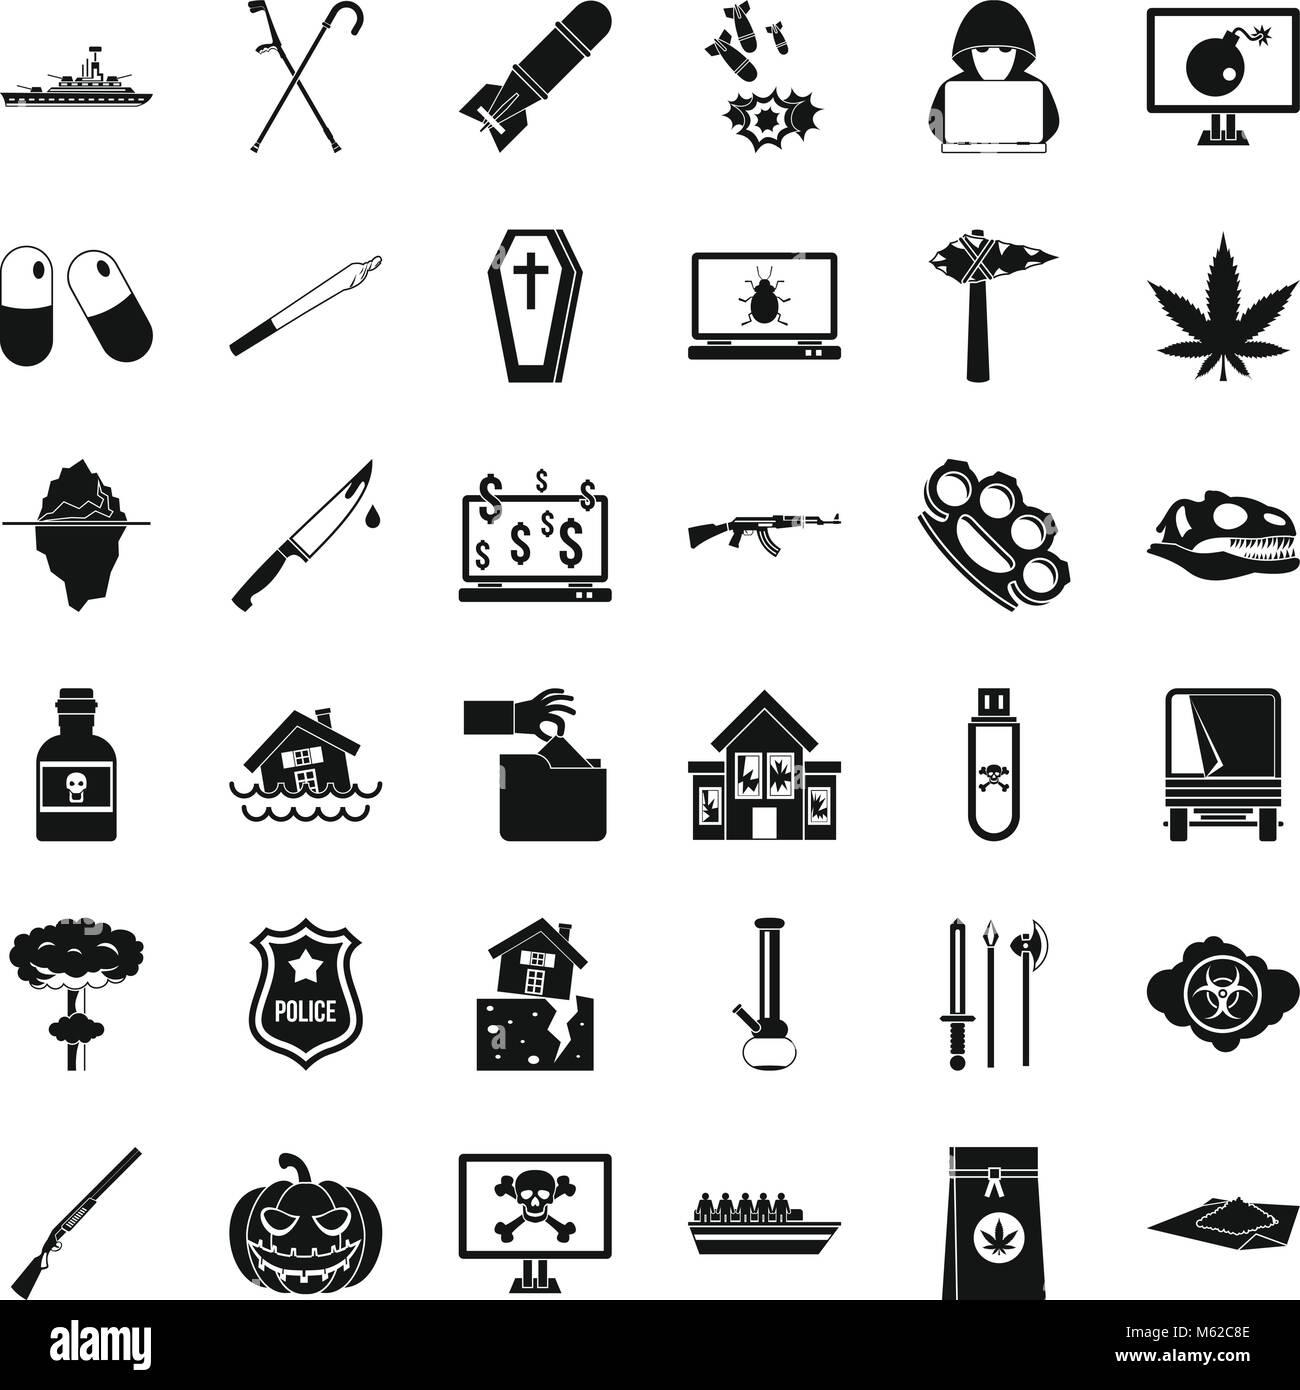 Tyranny icons set, simple style - Stock Image